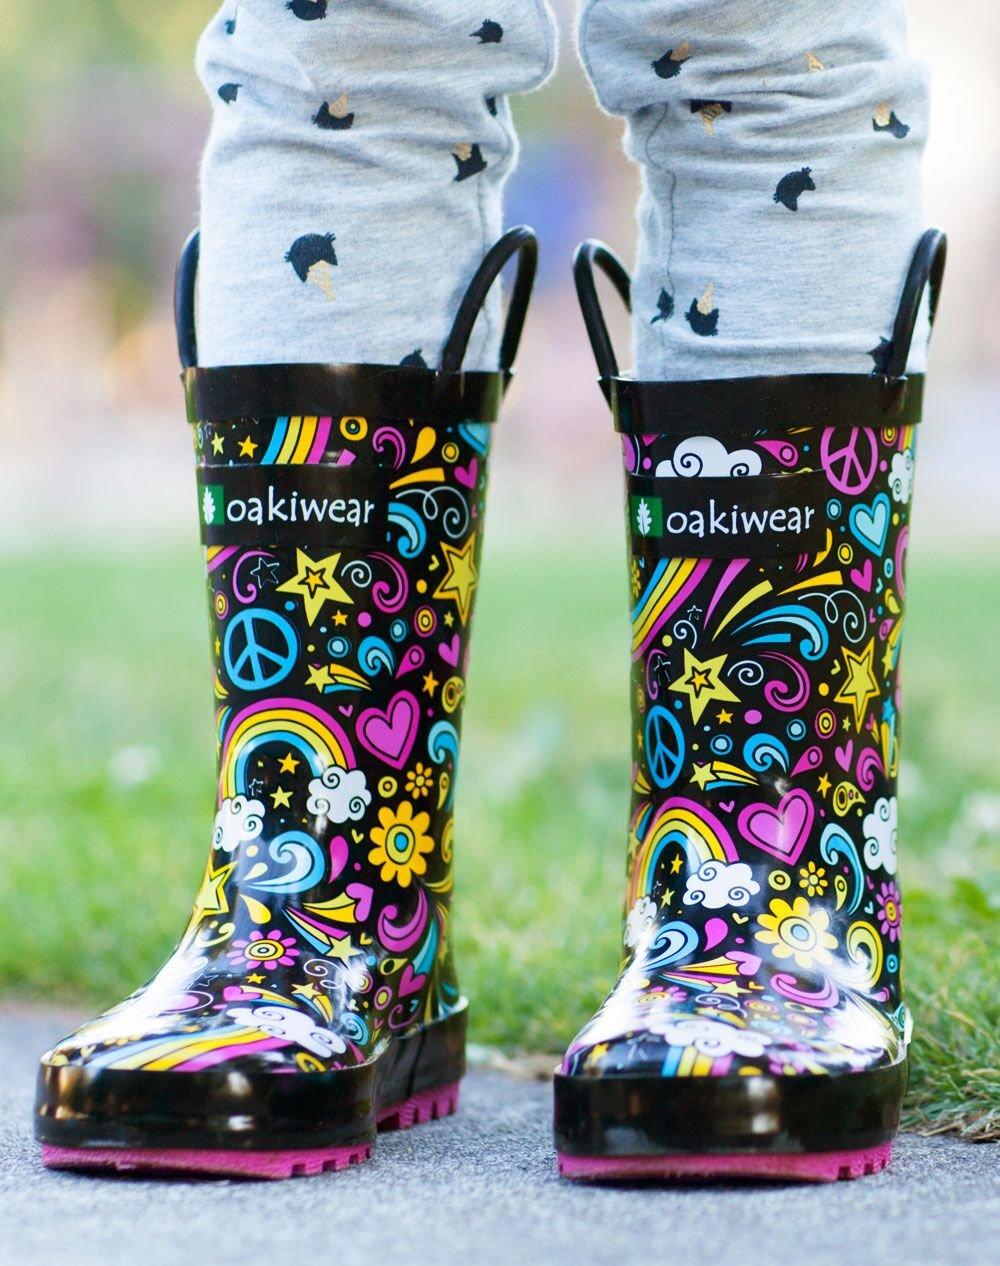 Oakiwear Kids Rubber Rain Boots with Easy-On Handles, Peace, Love & Rainbows, 11T US Toddler, Peace by Oakiwear (Image #6)